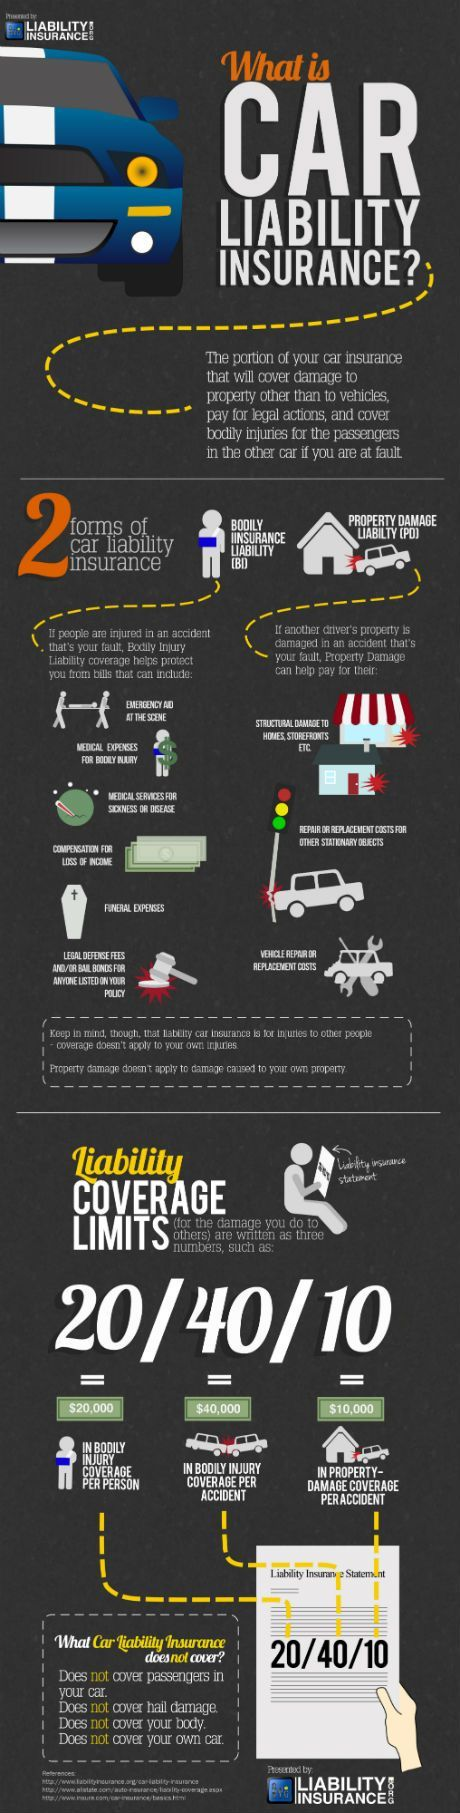 car liability insurance infographic #LifeInsuranceFactsTips